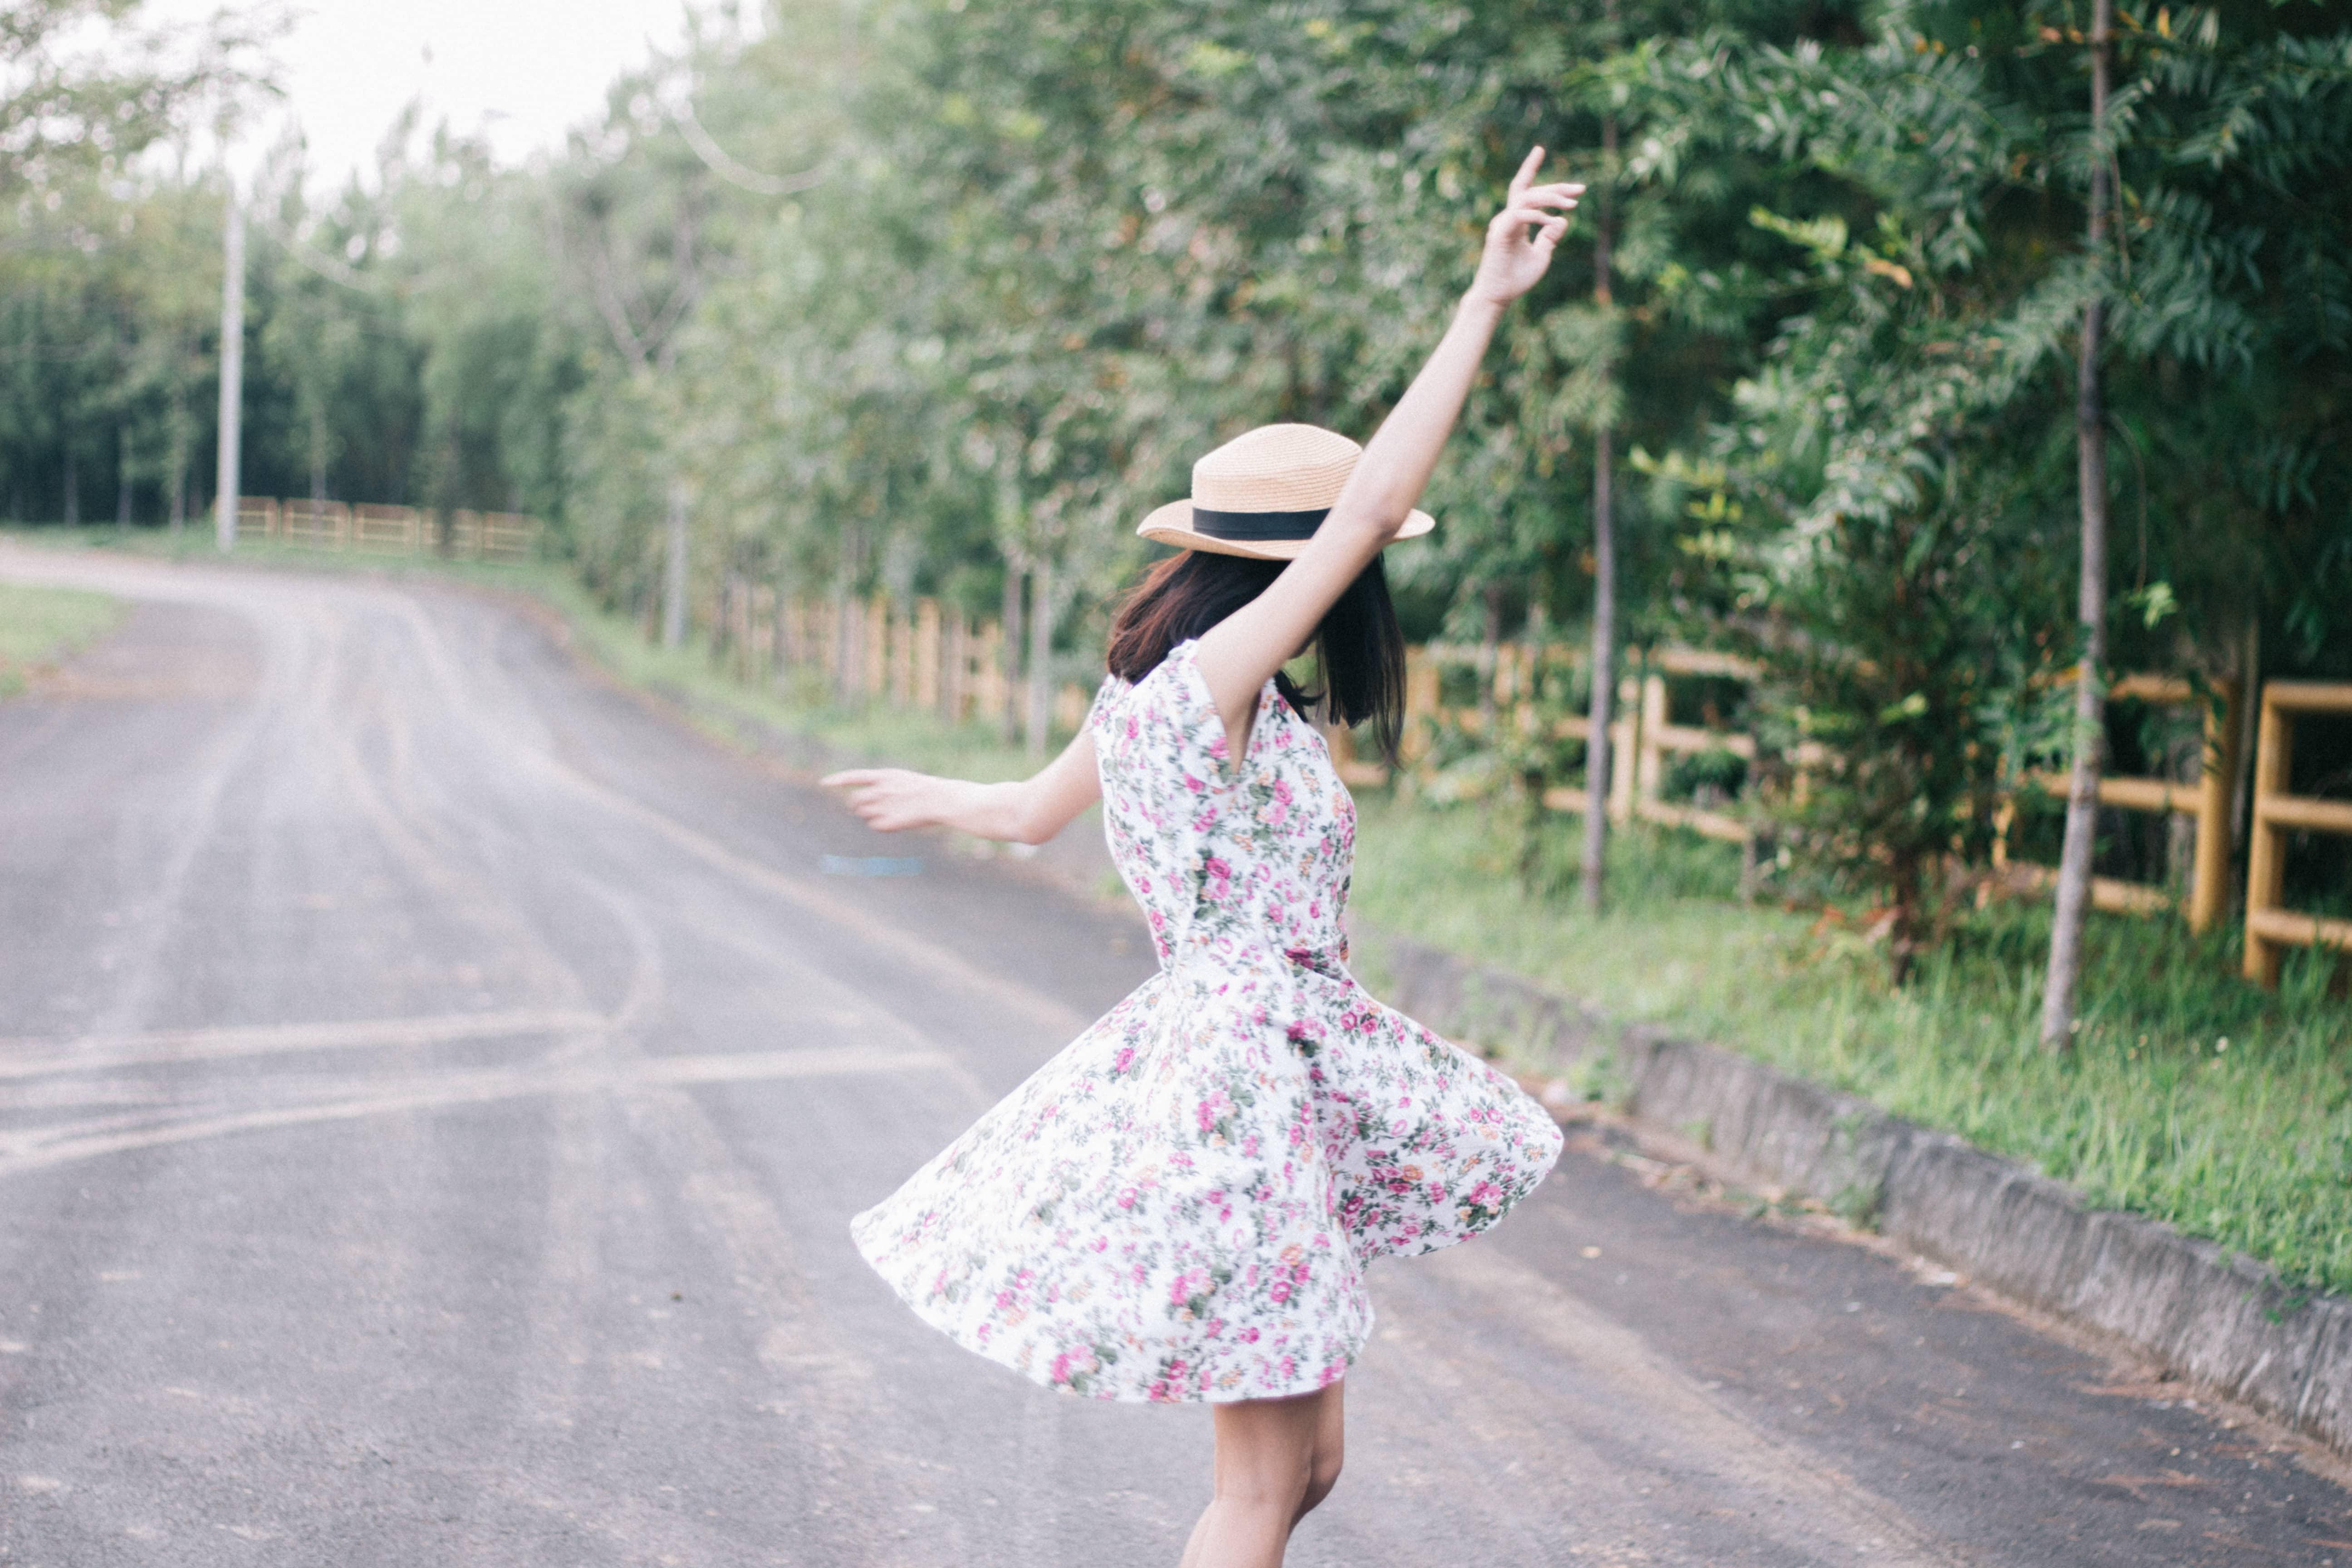 4 positive mindset shifts